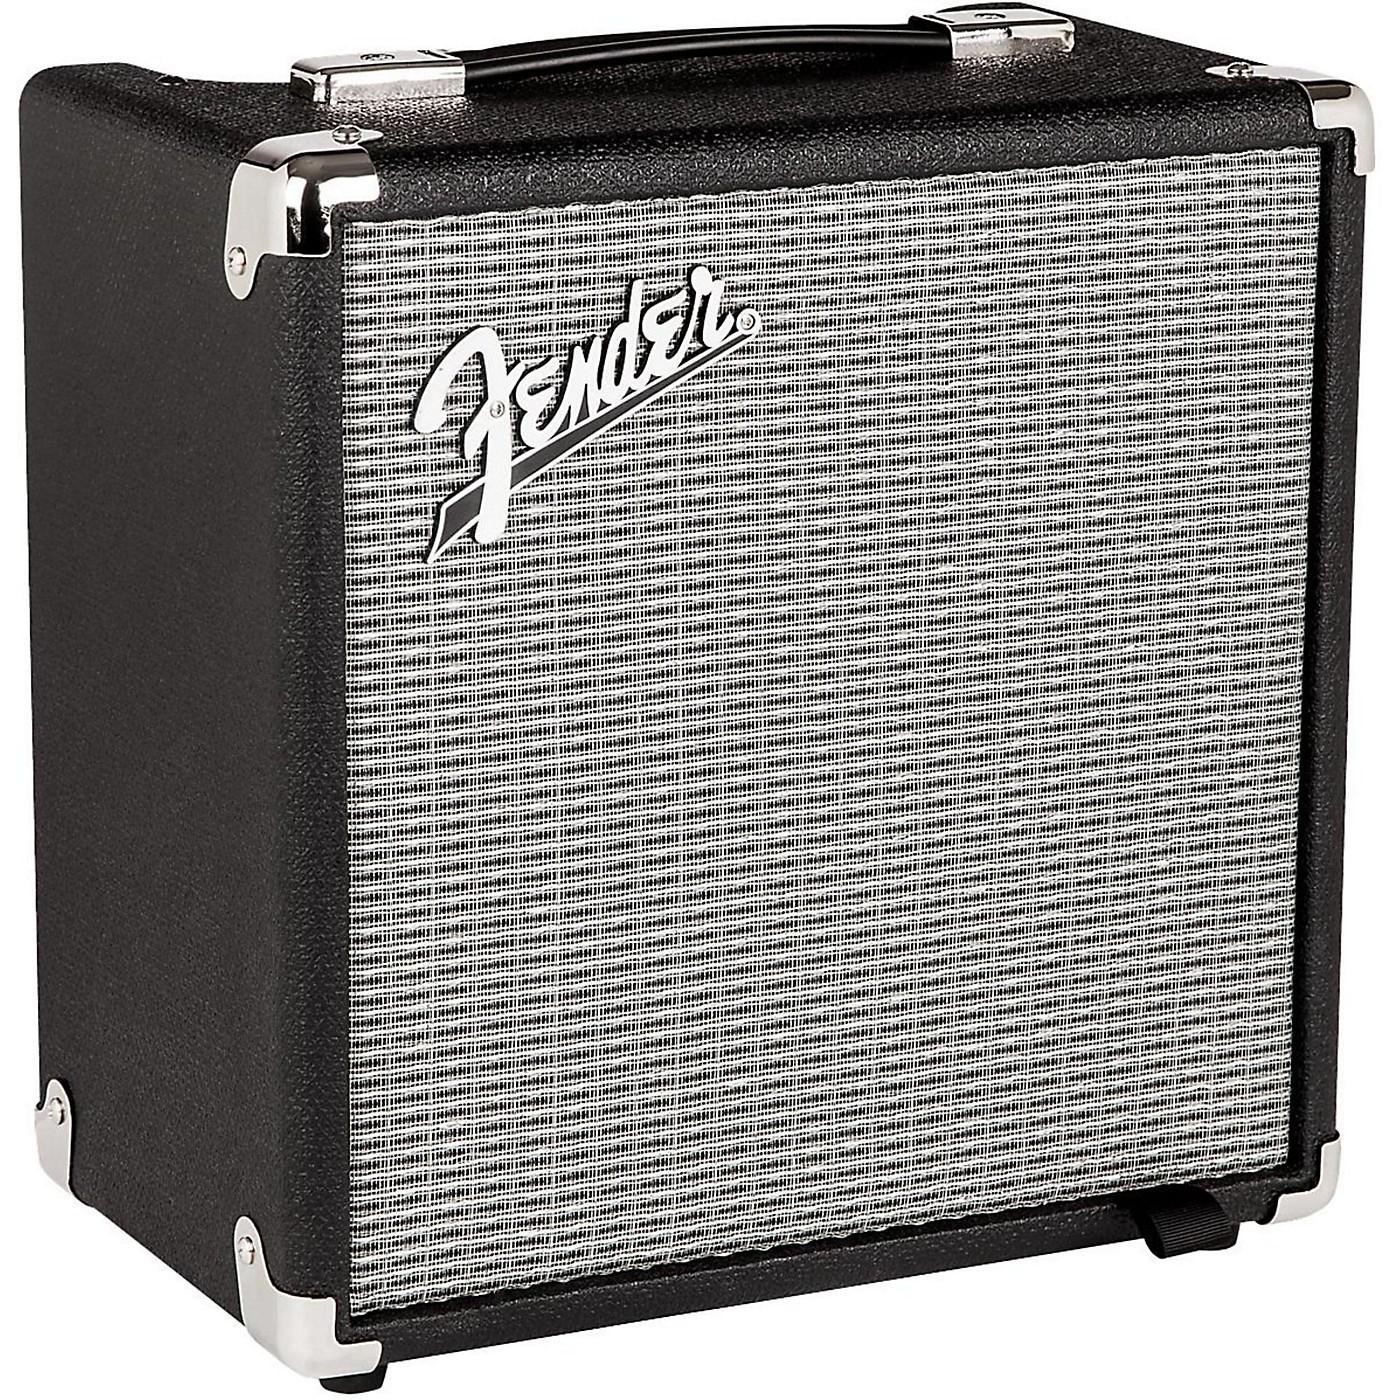 Fender Rumble 15 1x8 15W Bass Combo Amp thumbnail